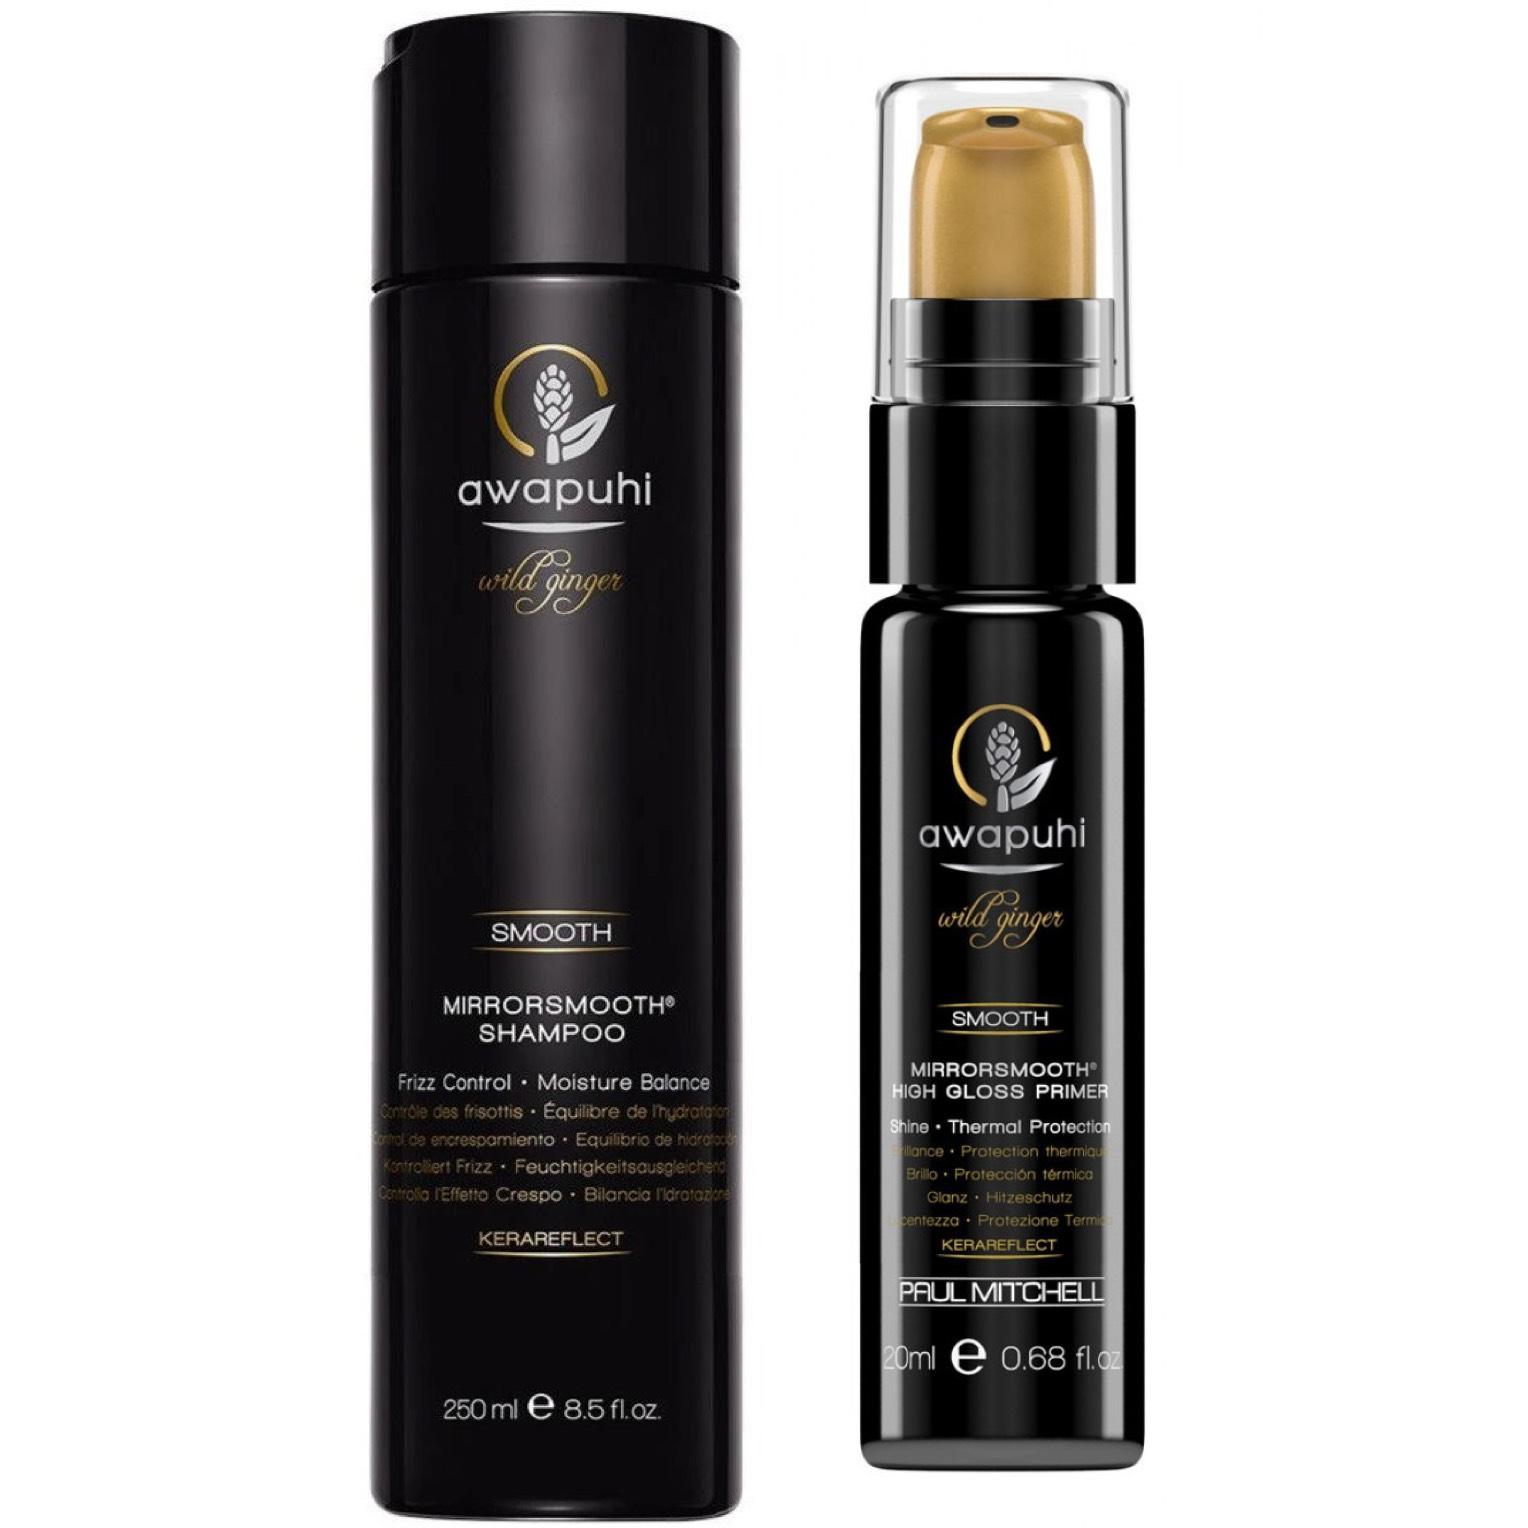 Paul Mitchell Awapuhi Wild Ginger Mirrorsmooth Shampoo 250ml + High Gloss Primer 20ml